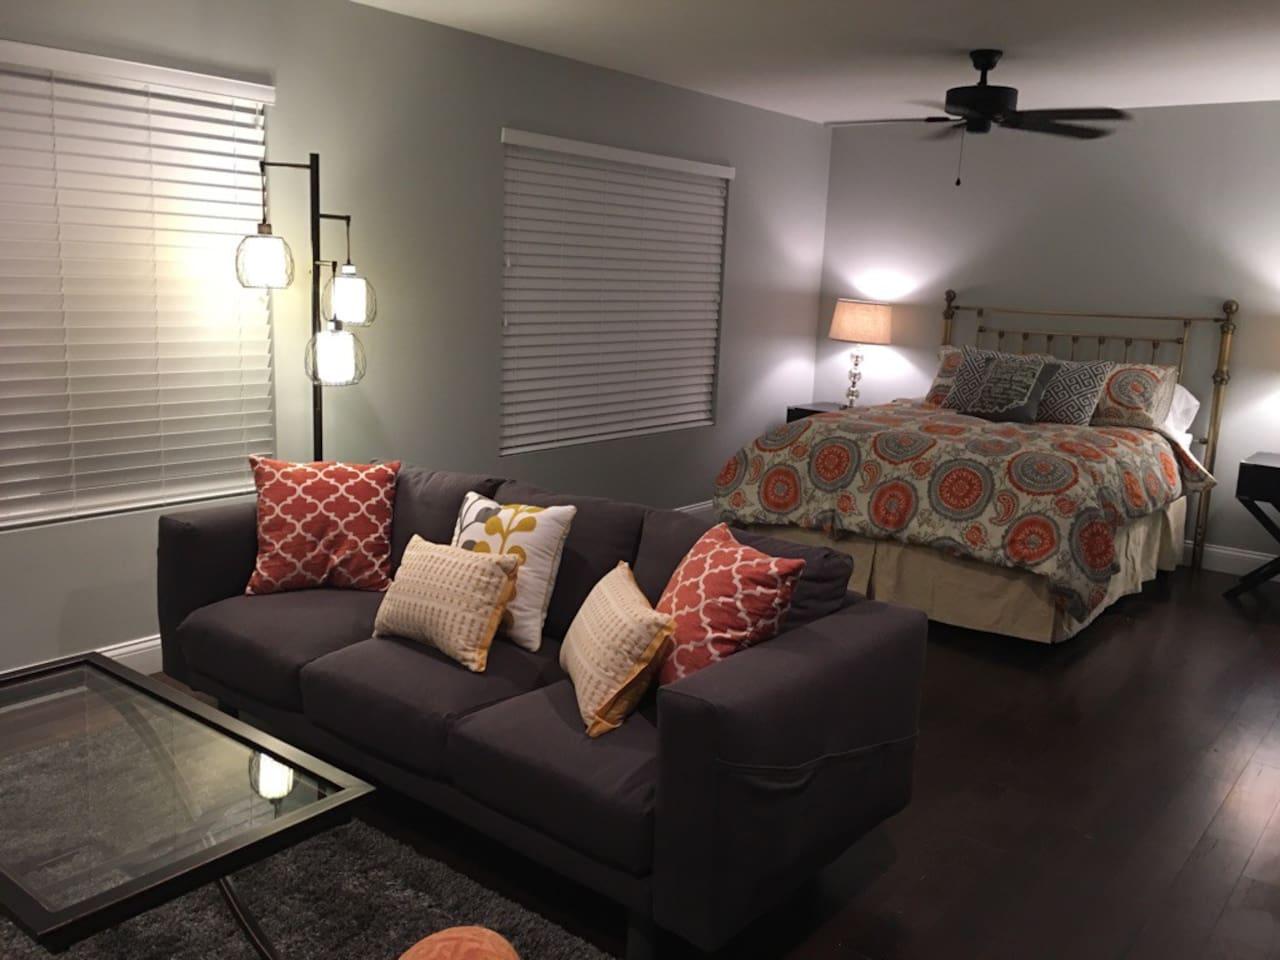 open style bedroom/living area